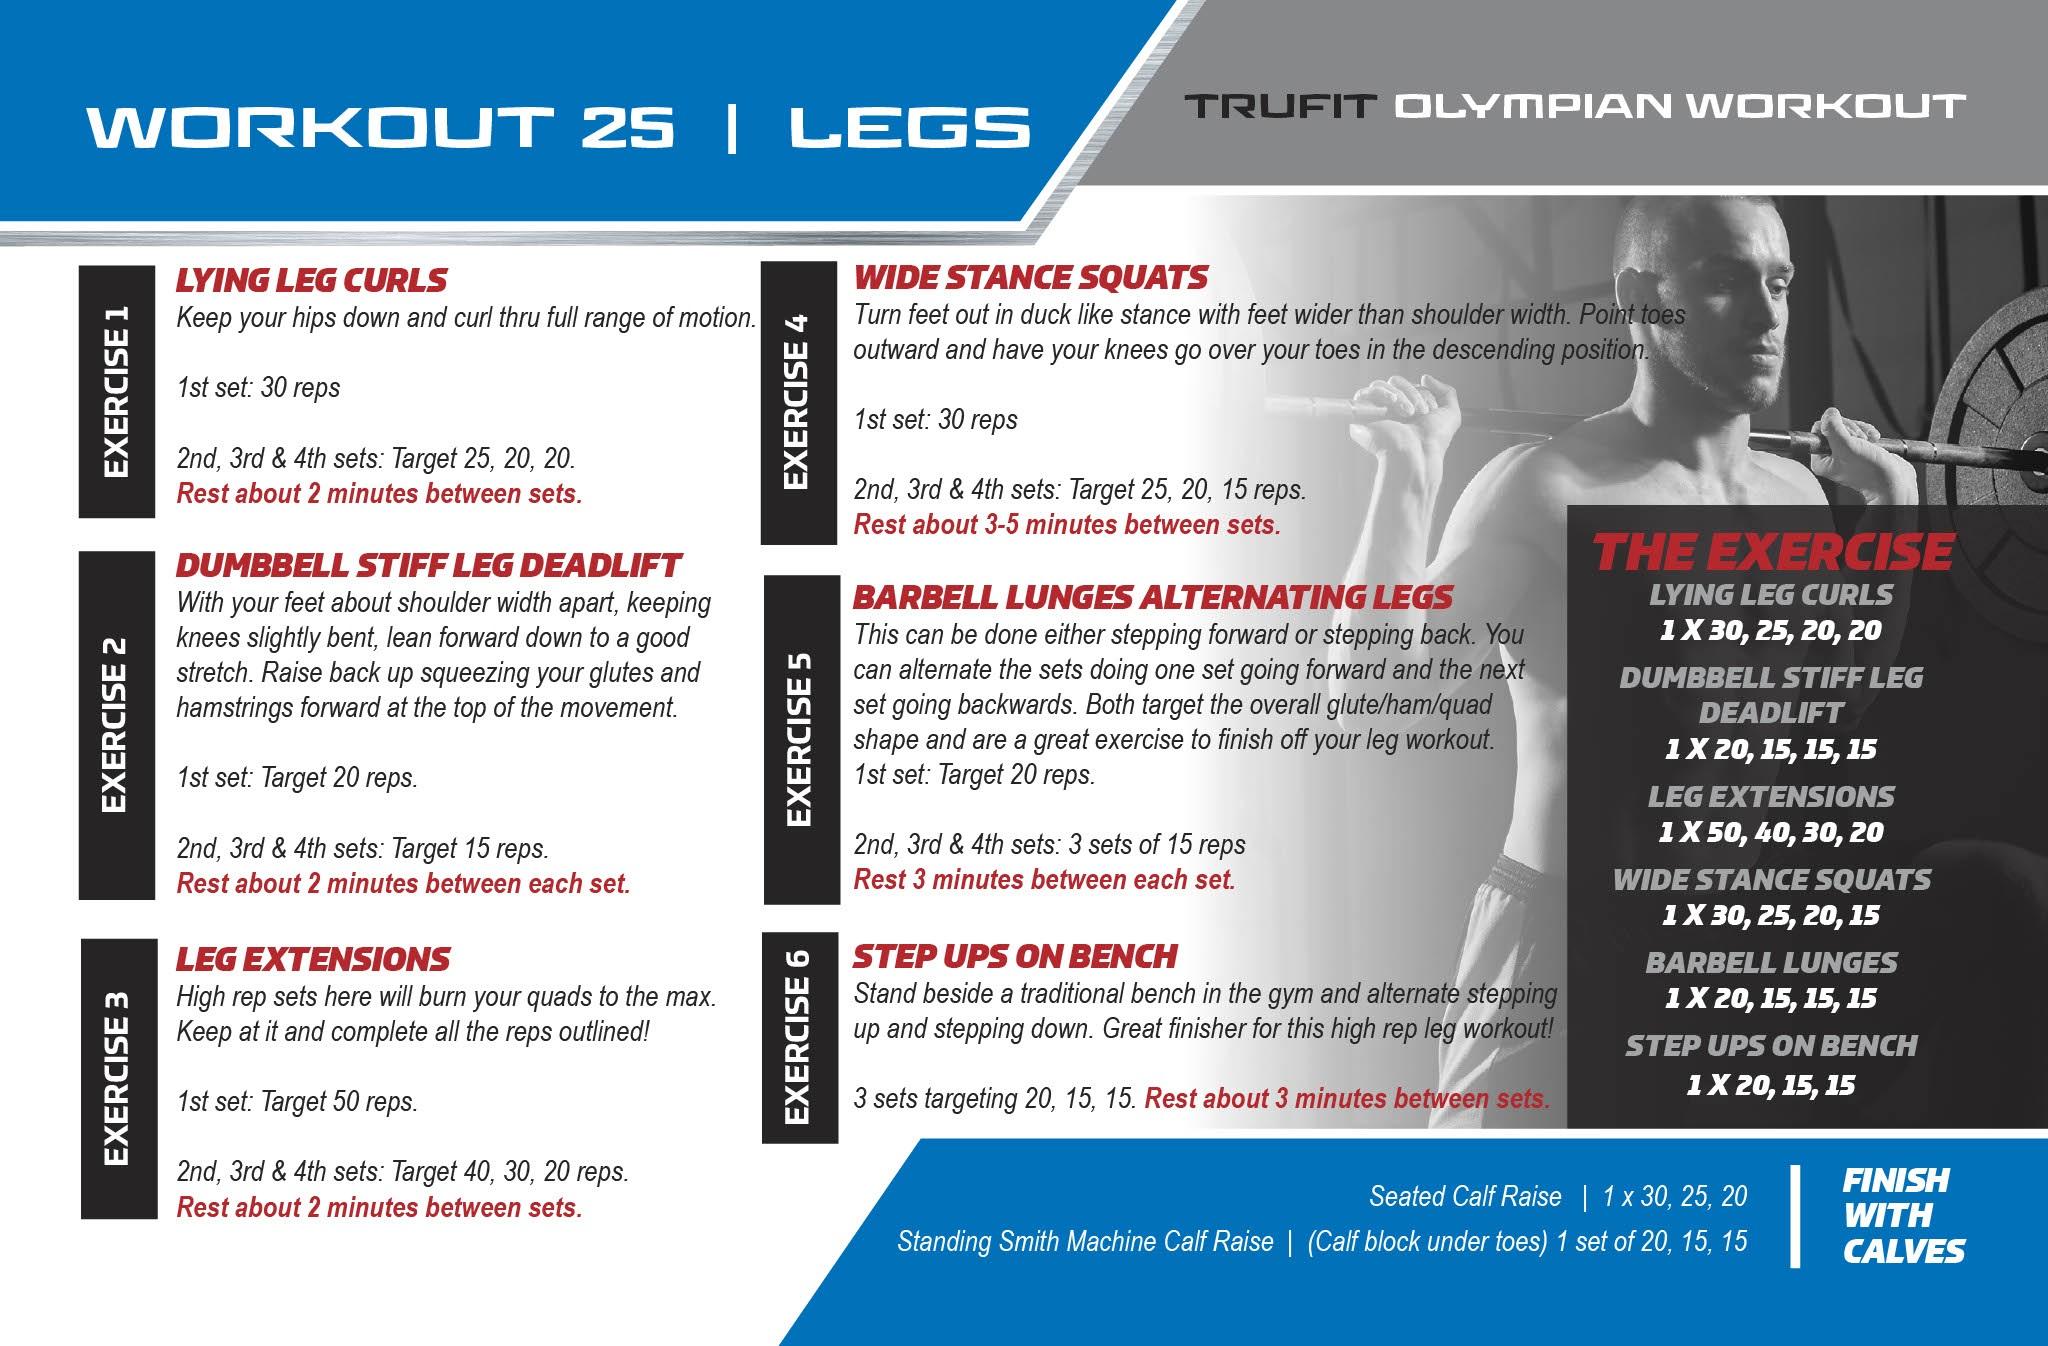 Day 25 - Legs